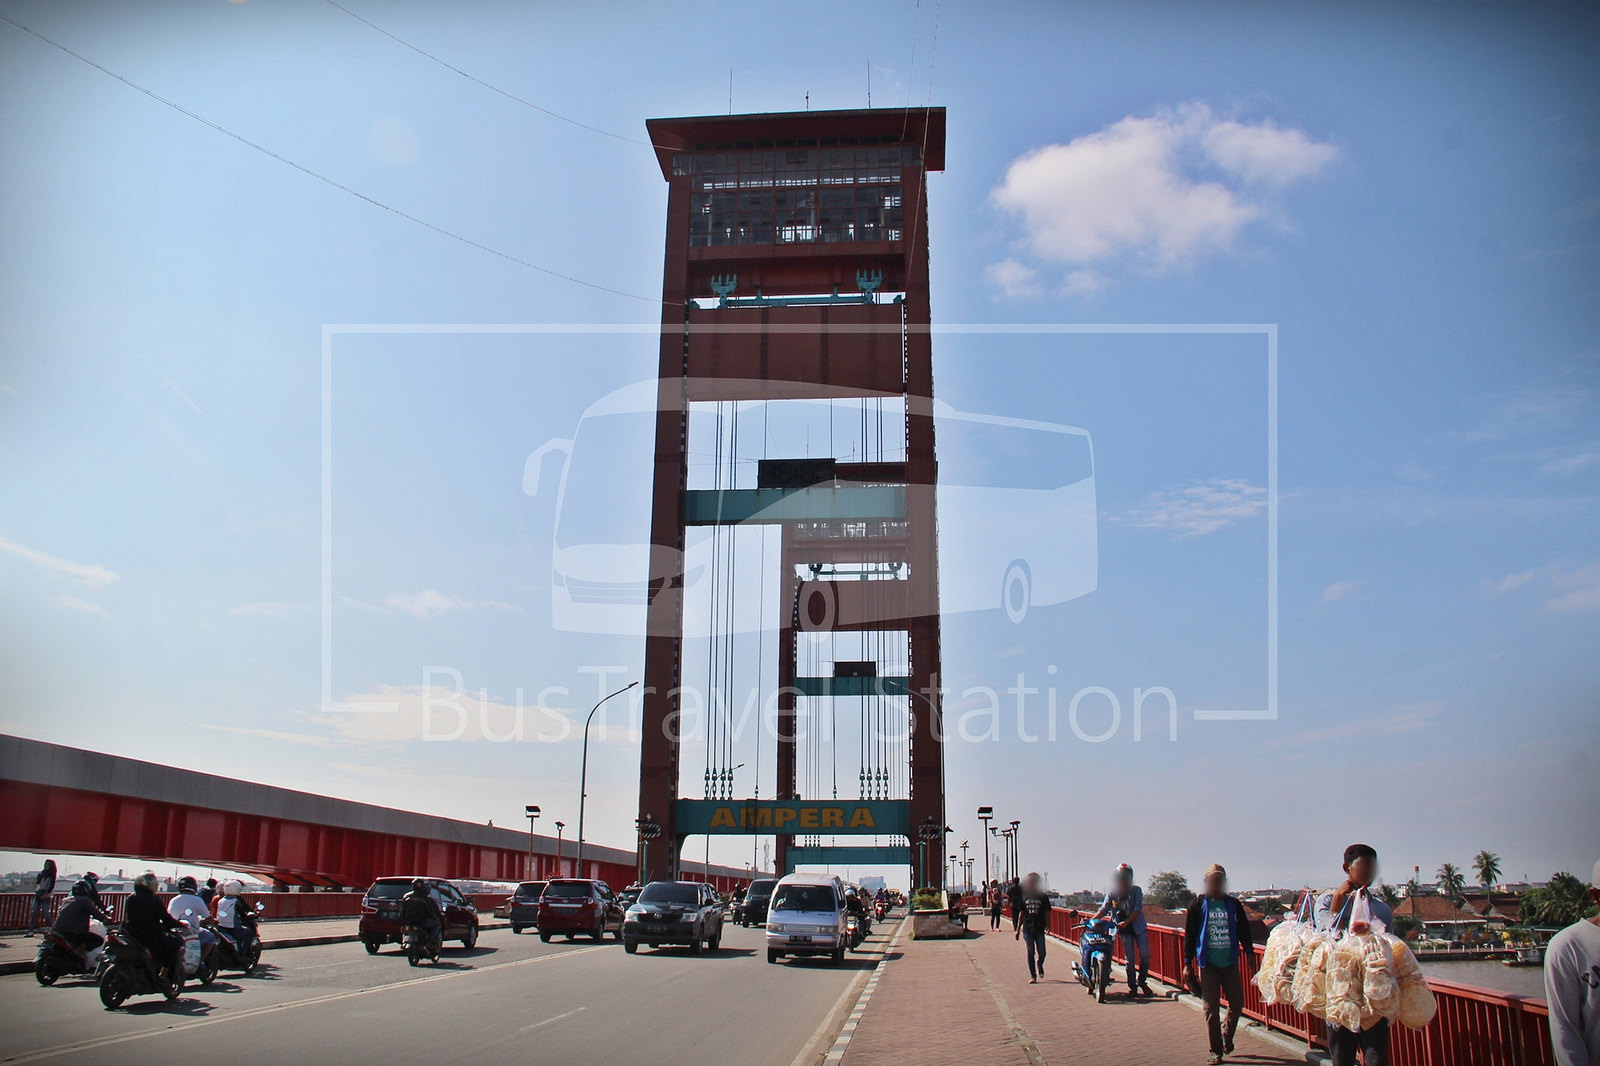 Masjid Agung Palembang Bustravel Station Main Attraction Ampera Bridge Vertical